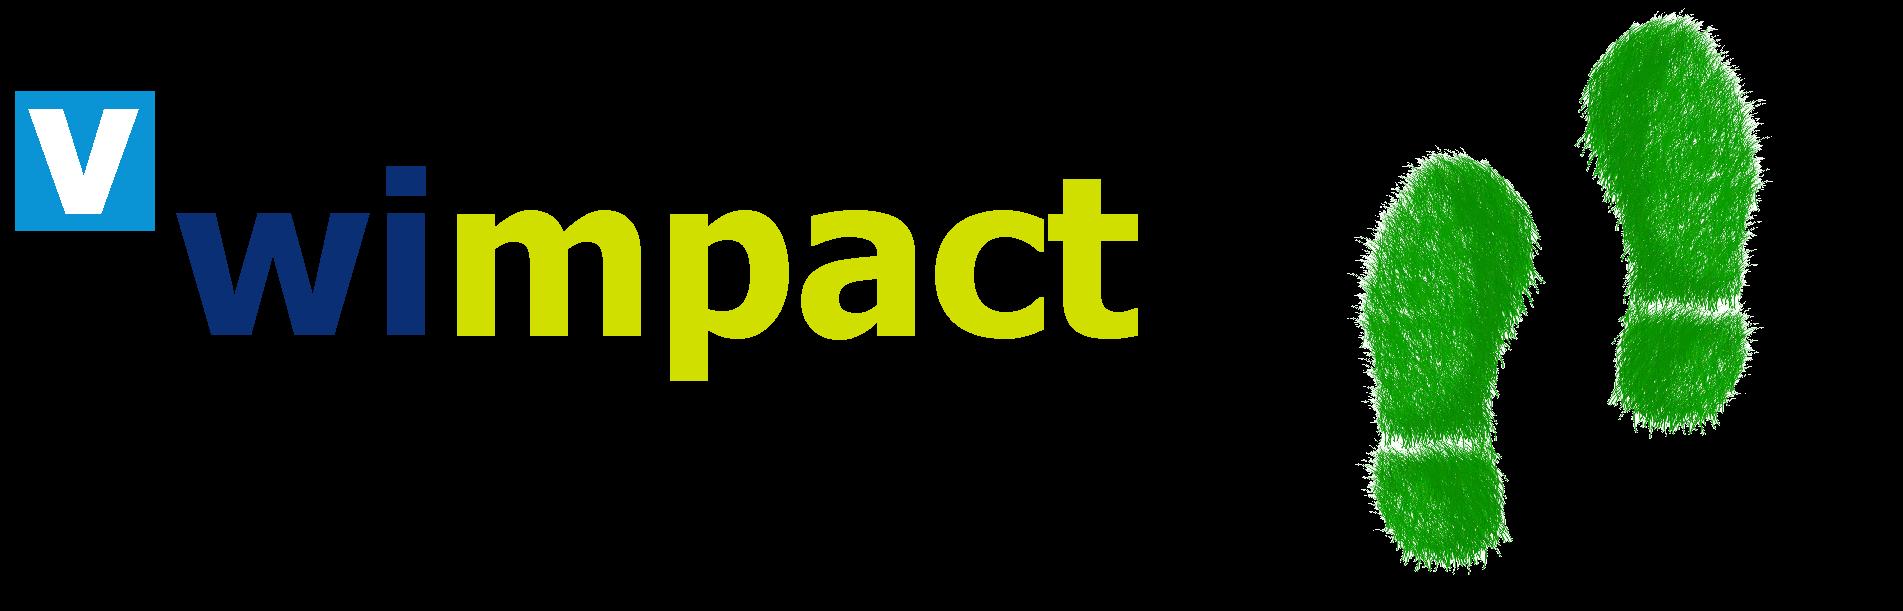 VWImpact-Logo-2020-Bildschirmfarben_transparent